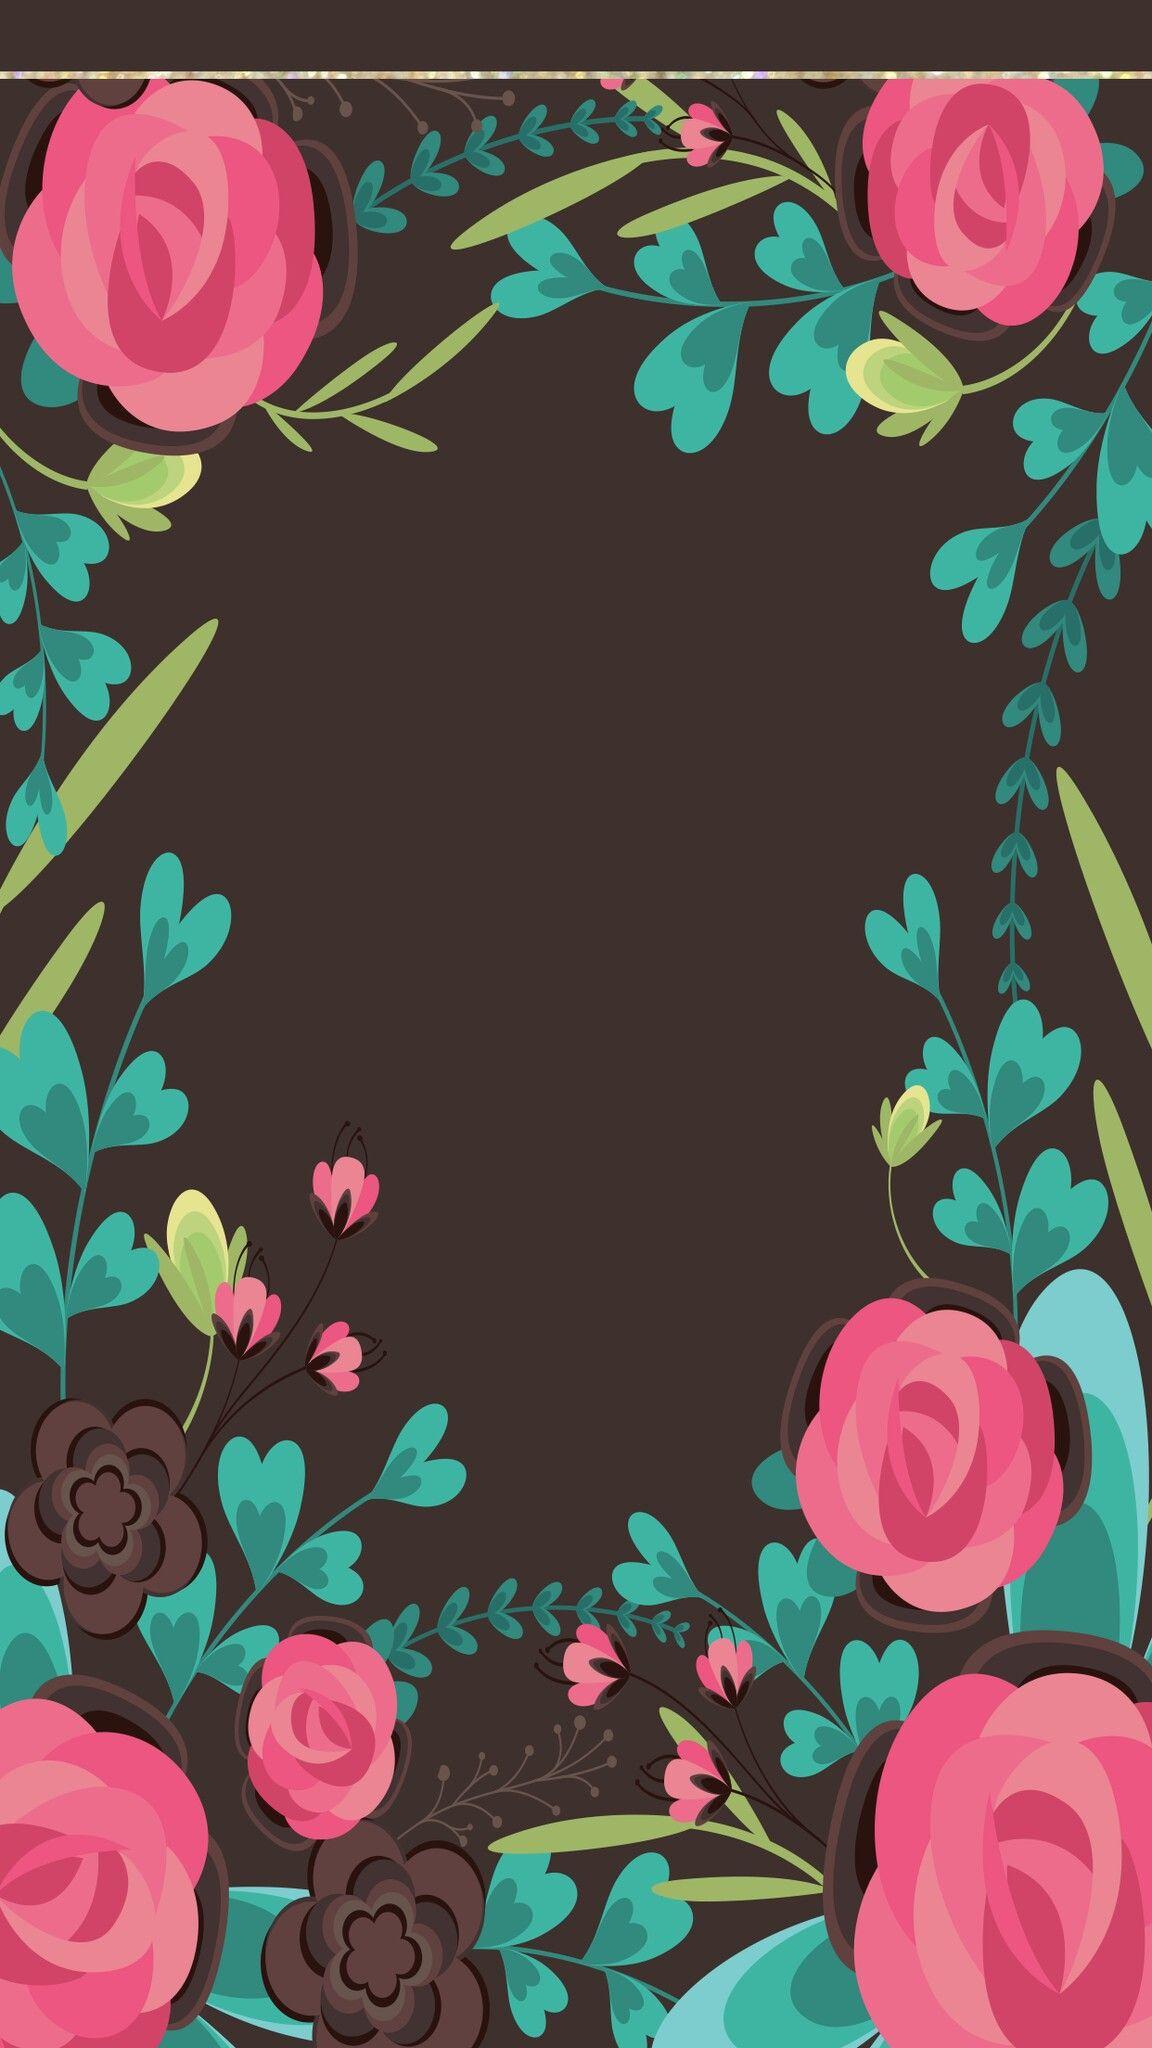 Must see Wallpaper Hello Kitty Smartphone - 38c3e29cae3e09ed51ee363664960f0e  Perfect Image Reference_92669.jpg